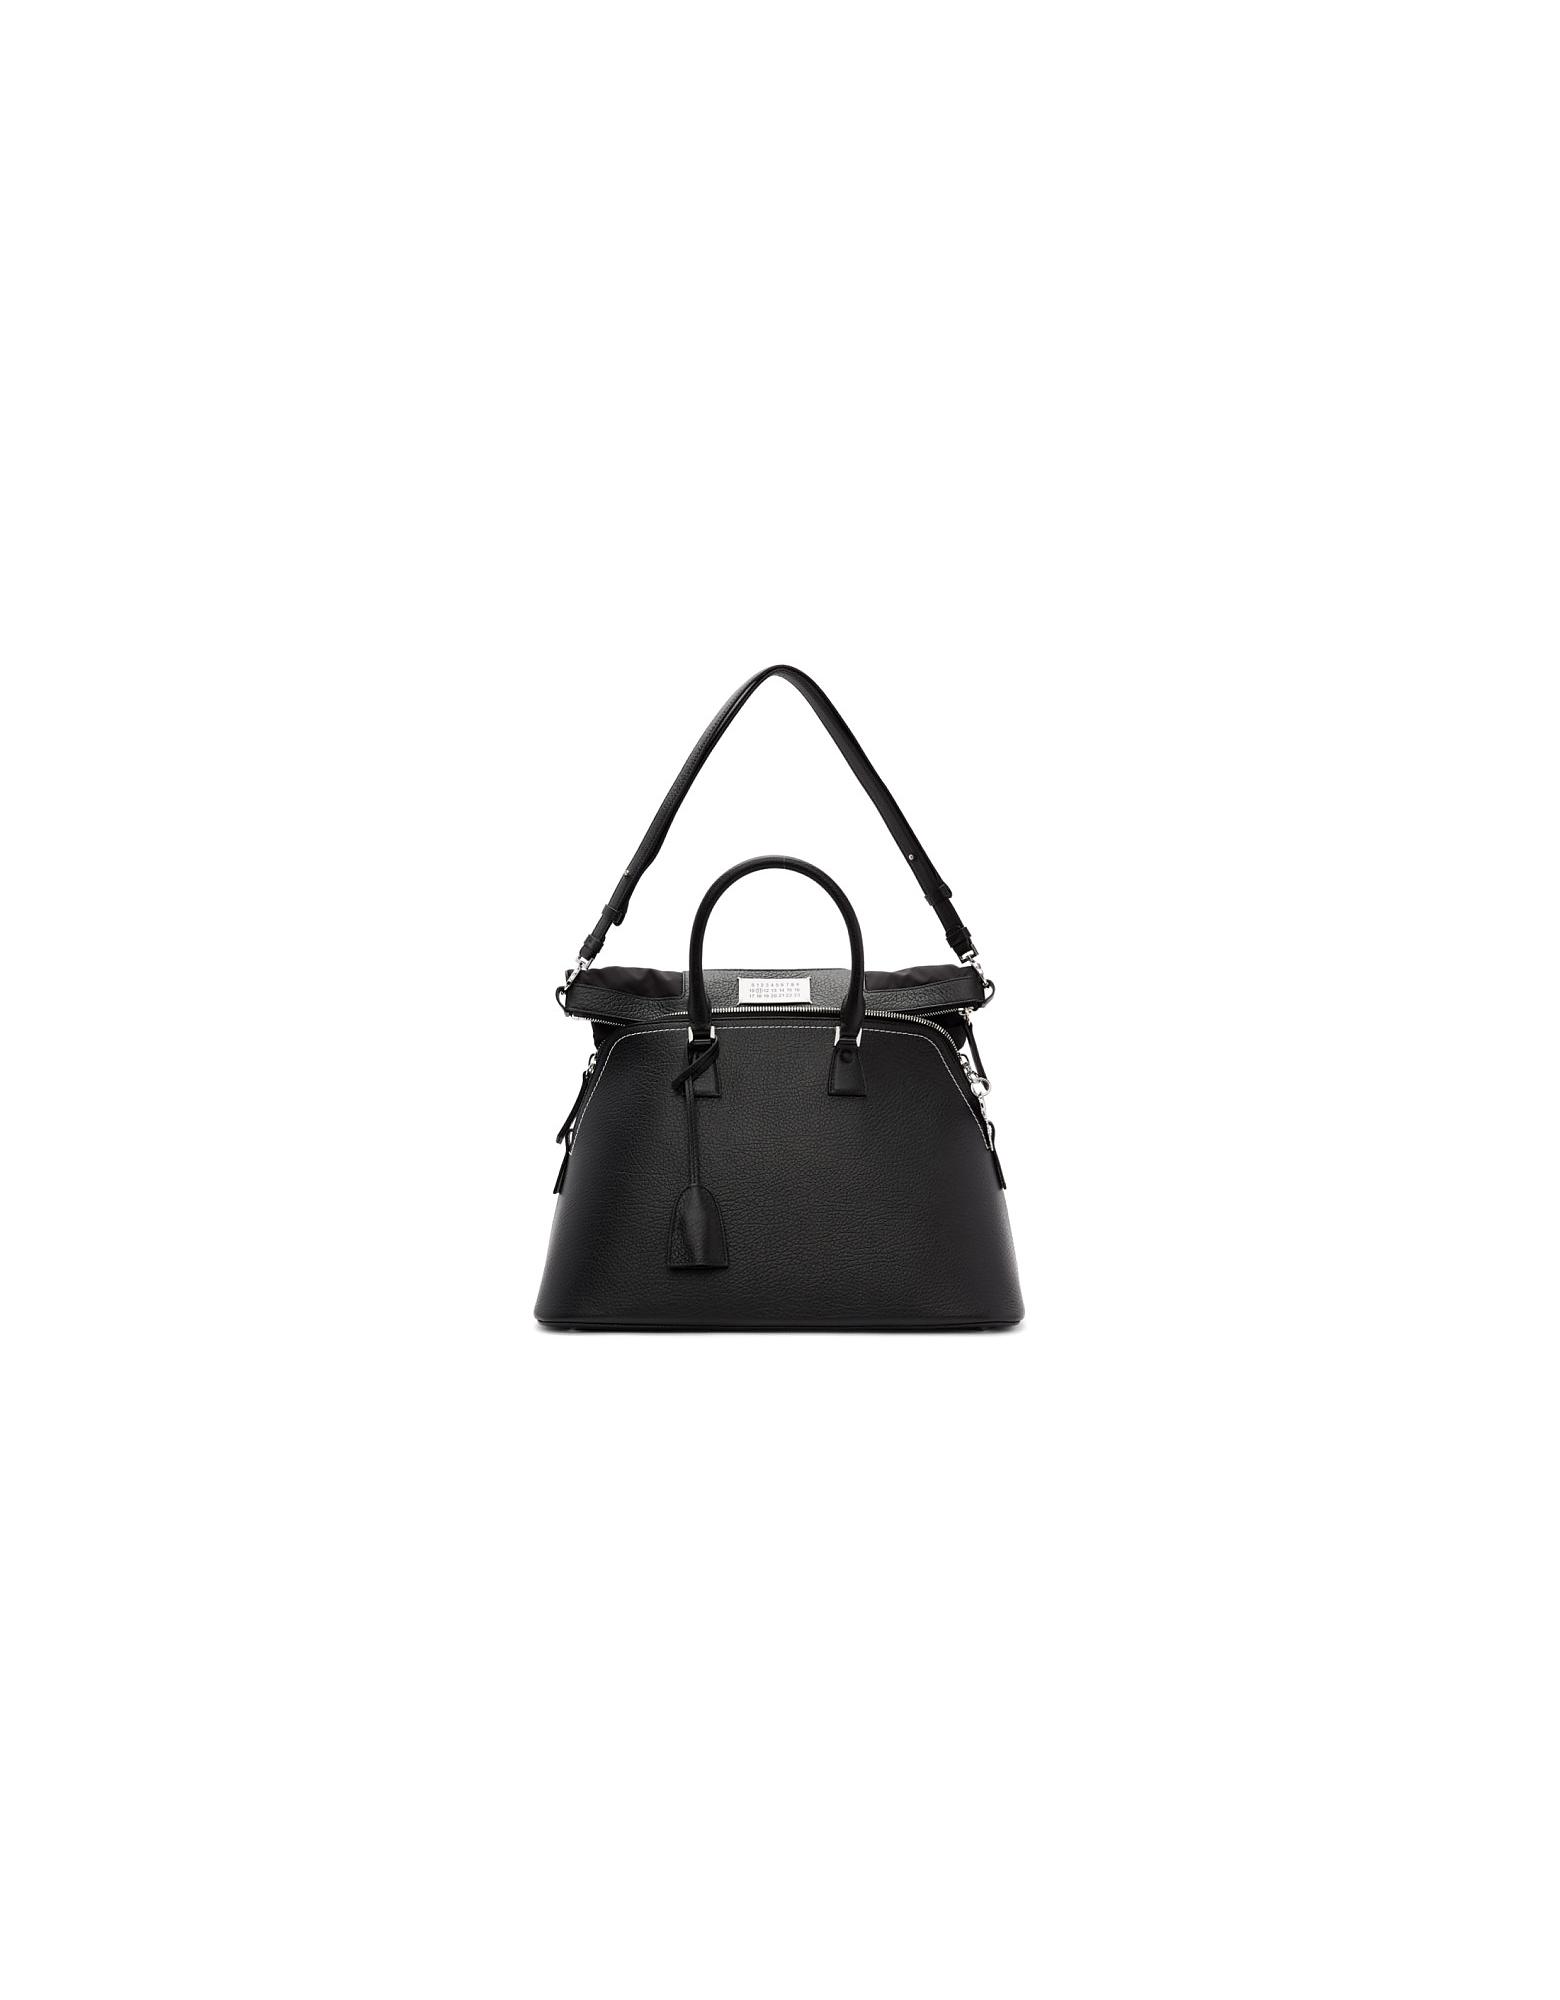 Maison Margiela Designer Handbags, Black Large 5AC Bag